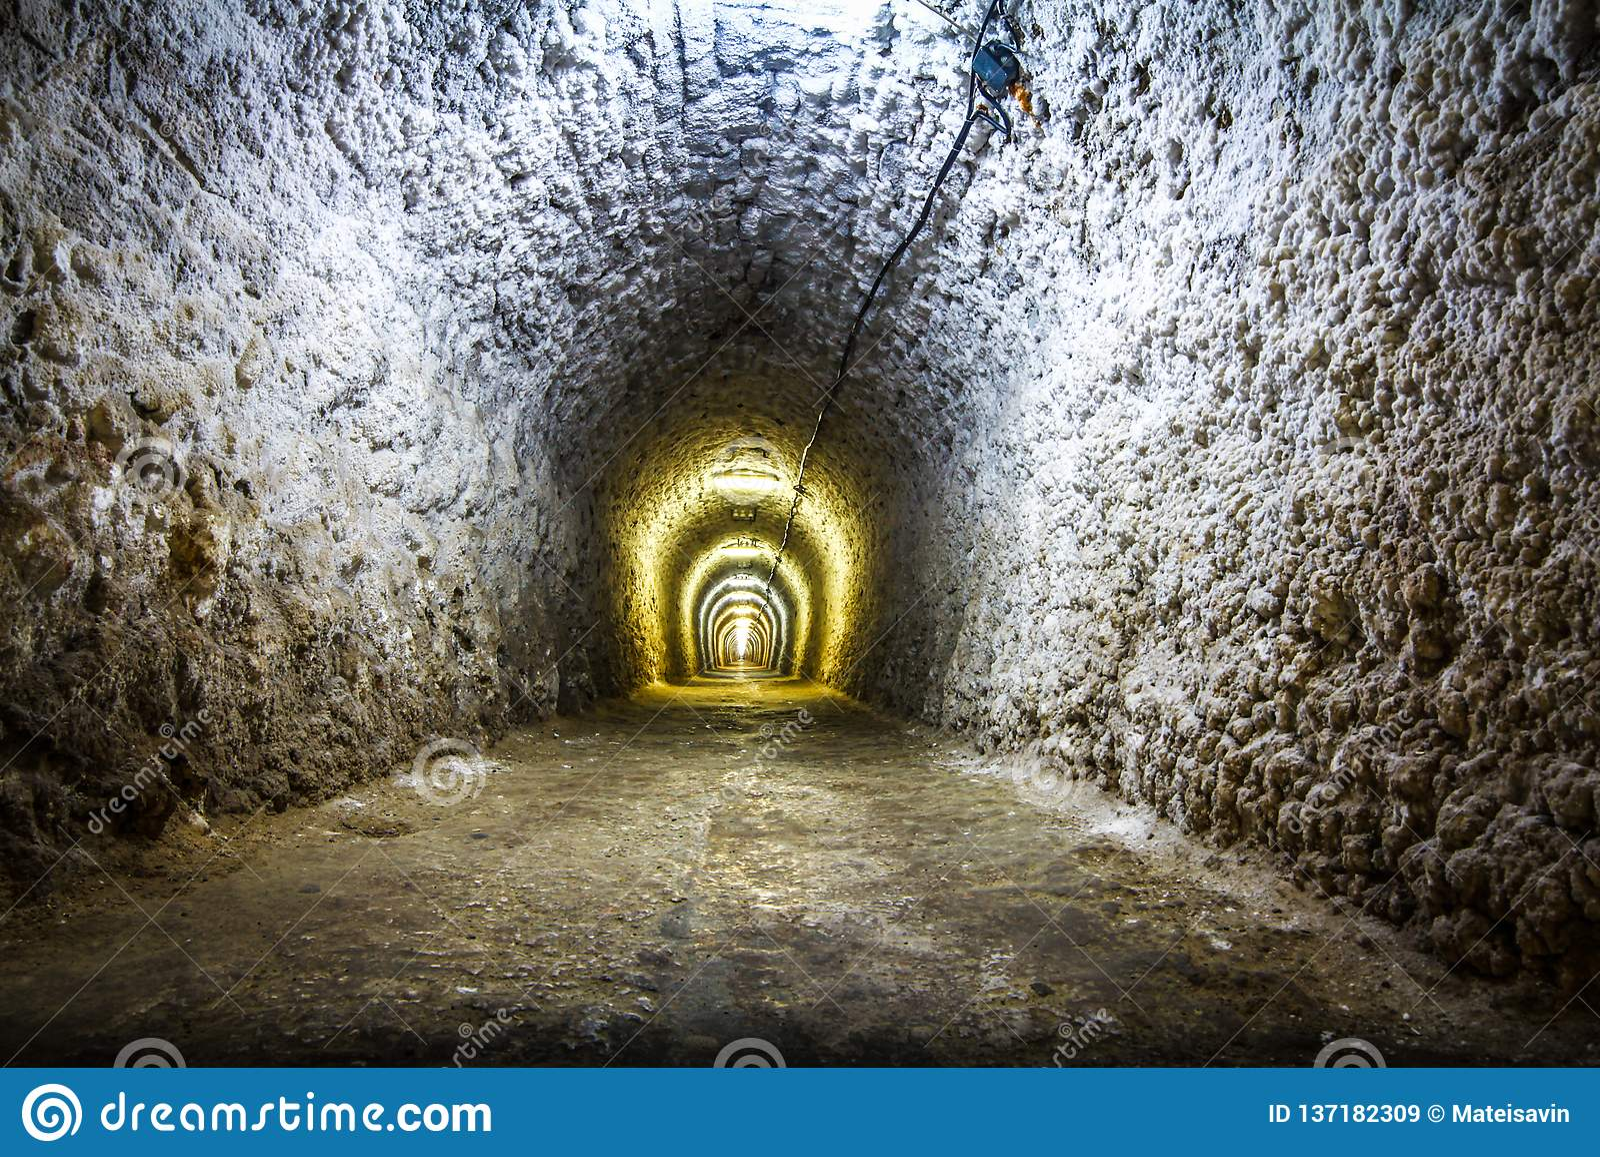 Lights in a mine salt tunnel